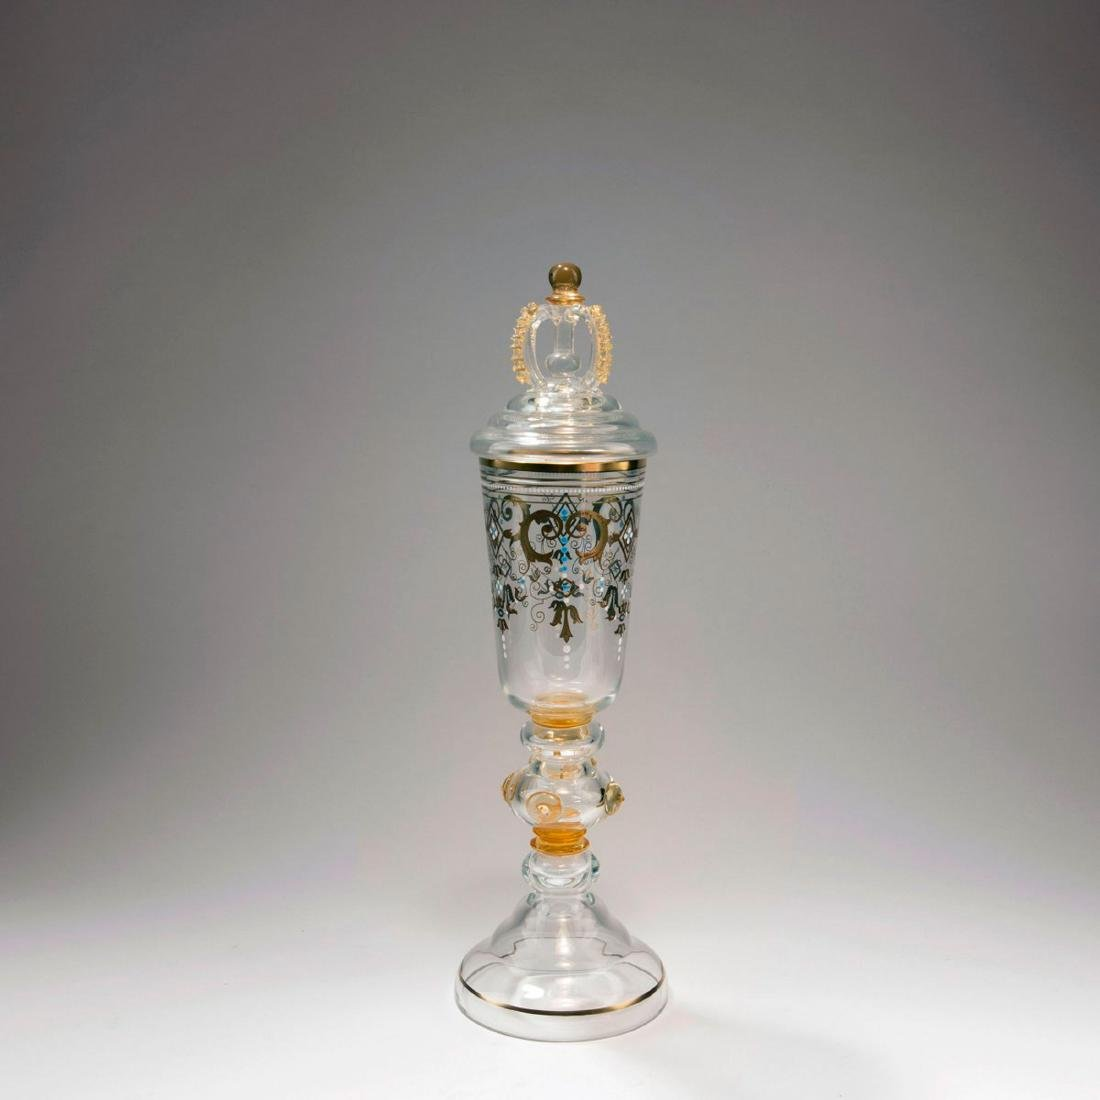 Covered goblet, c. 1885